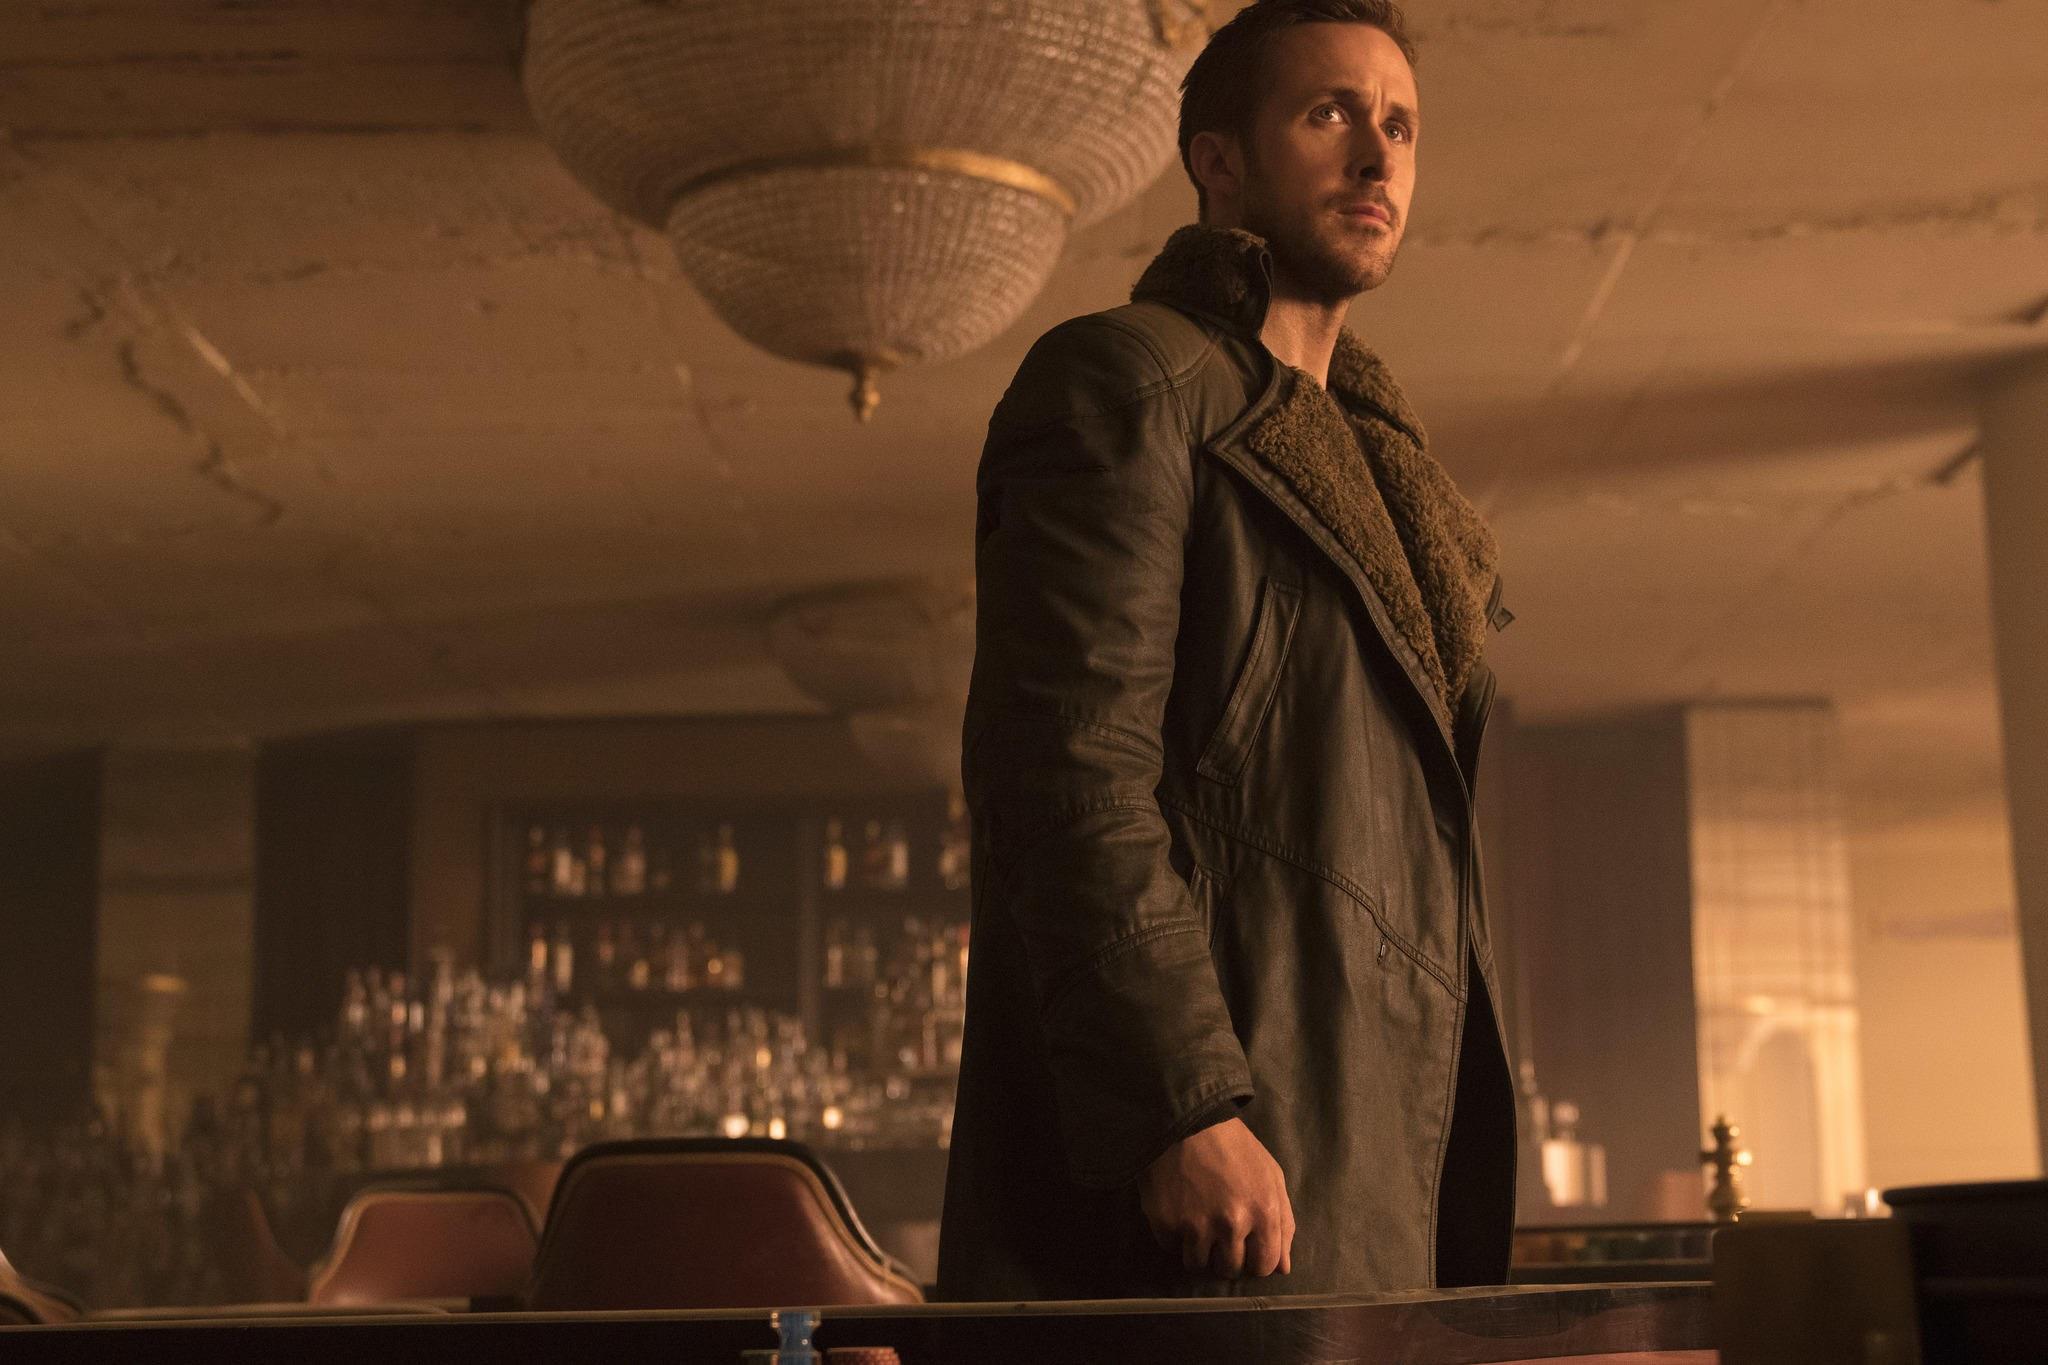 The best tribute to Blade Runner 2049 : デニス・ヴィルヌーヴ監督のSF映画の傑作「ブレード・ランナー 2049」の断片を美しく巧みに寄せ集めたトリビュート・ビデオ「ストレンジャー」! !